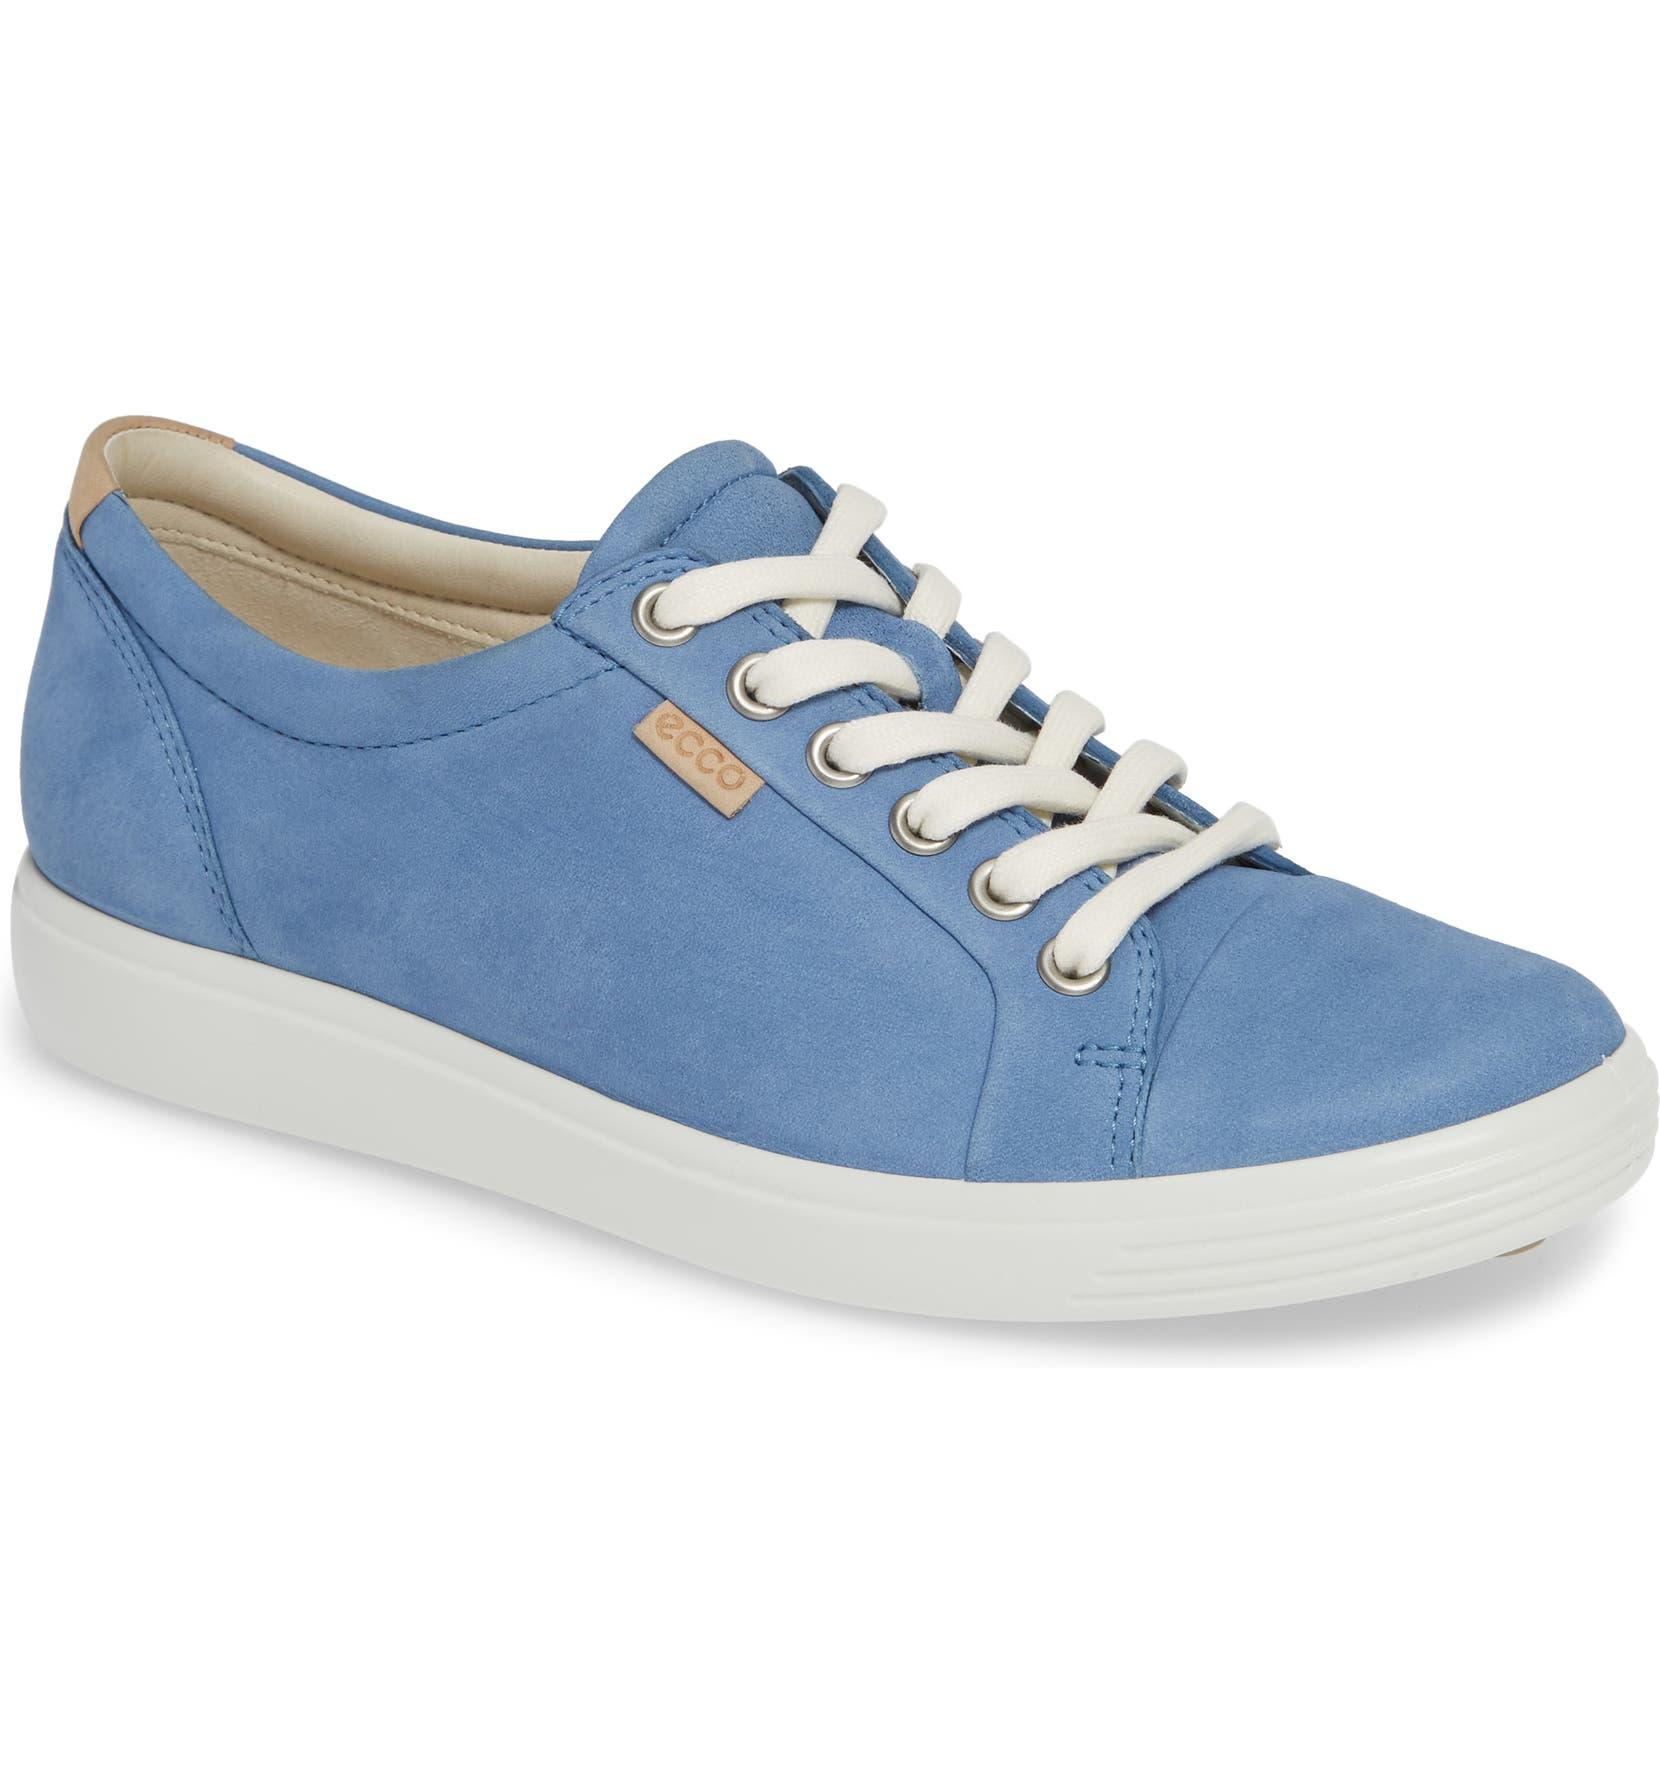 8a9ffdf067 ECCO Soft 7 Sneaker (Women) | Nordstrom